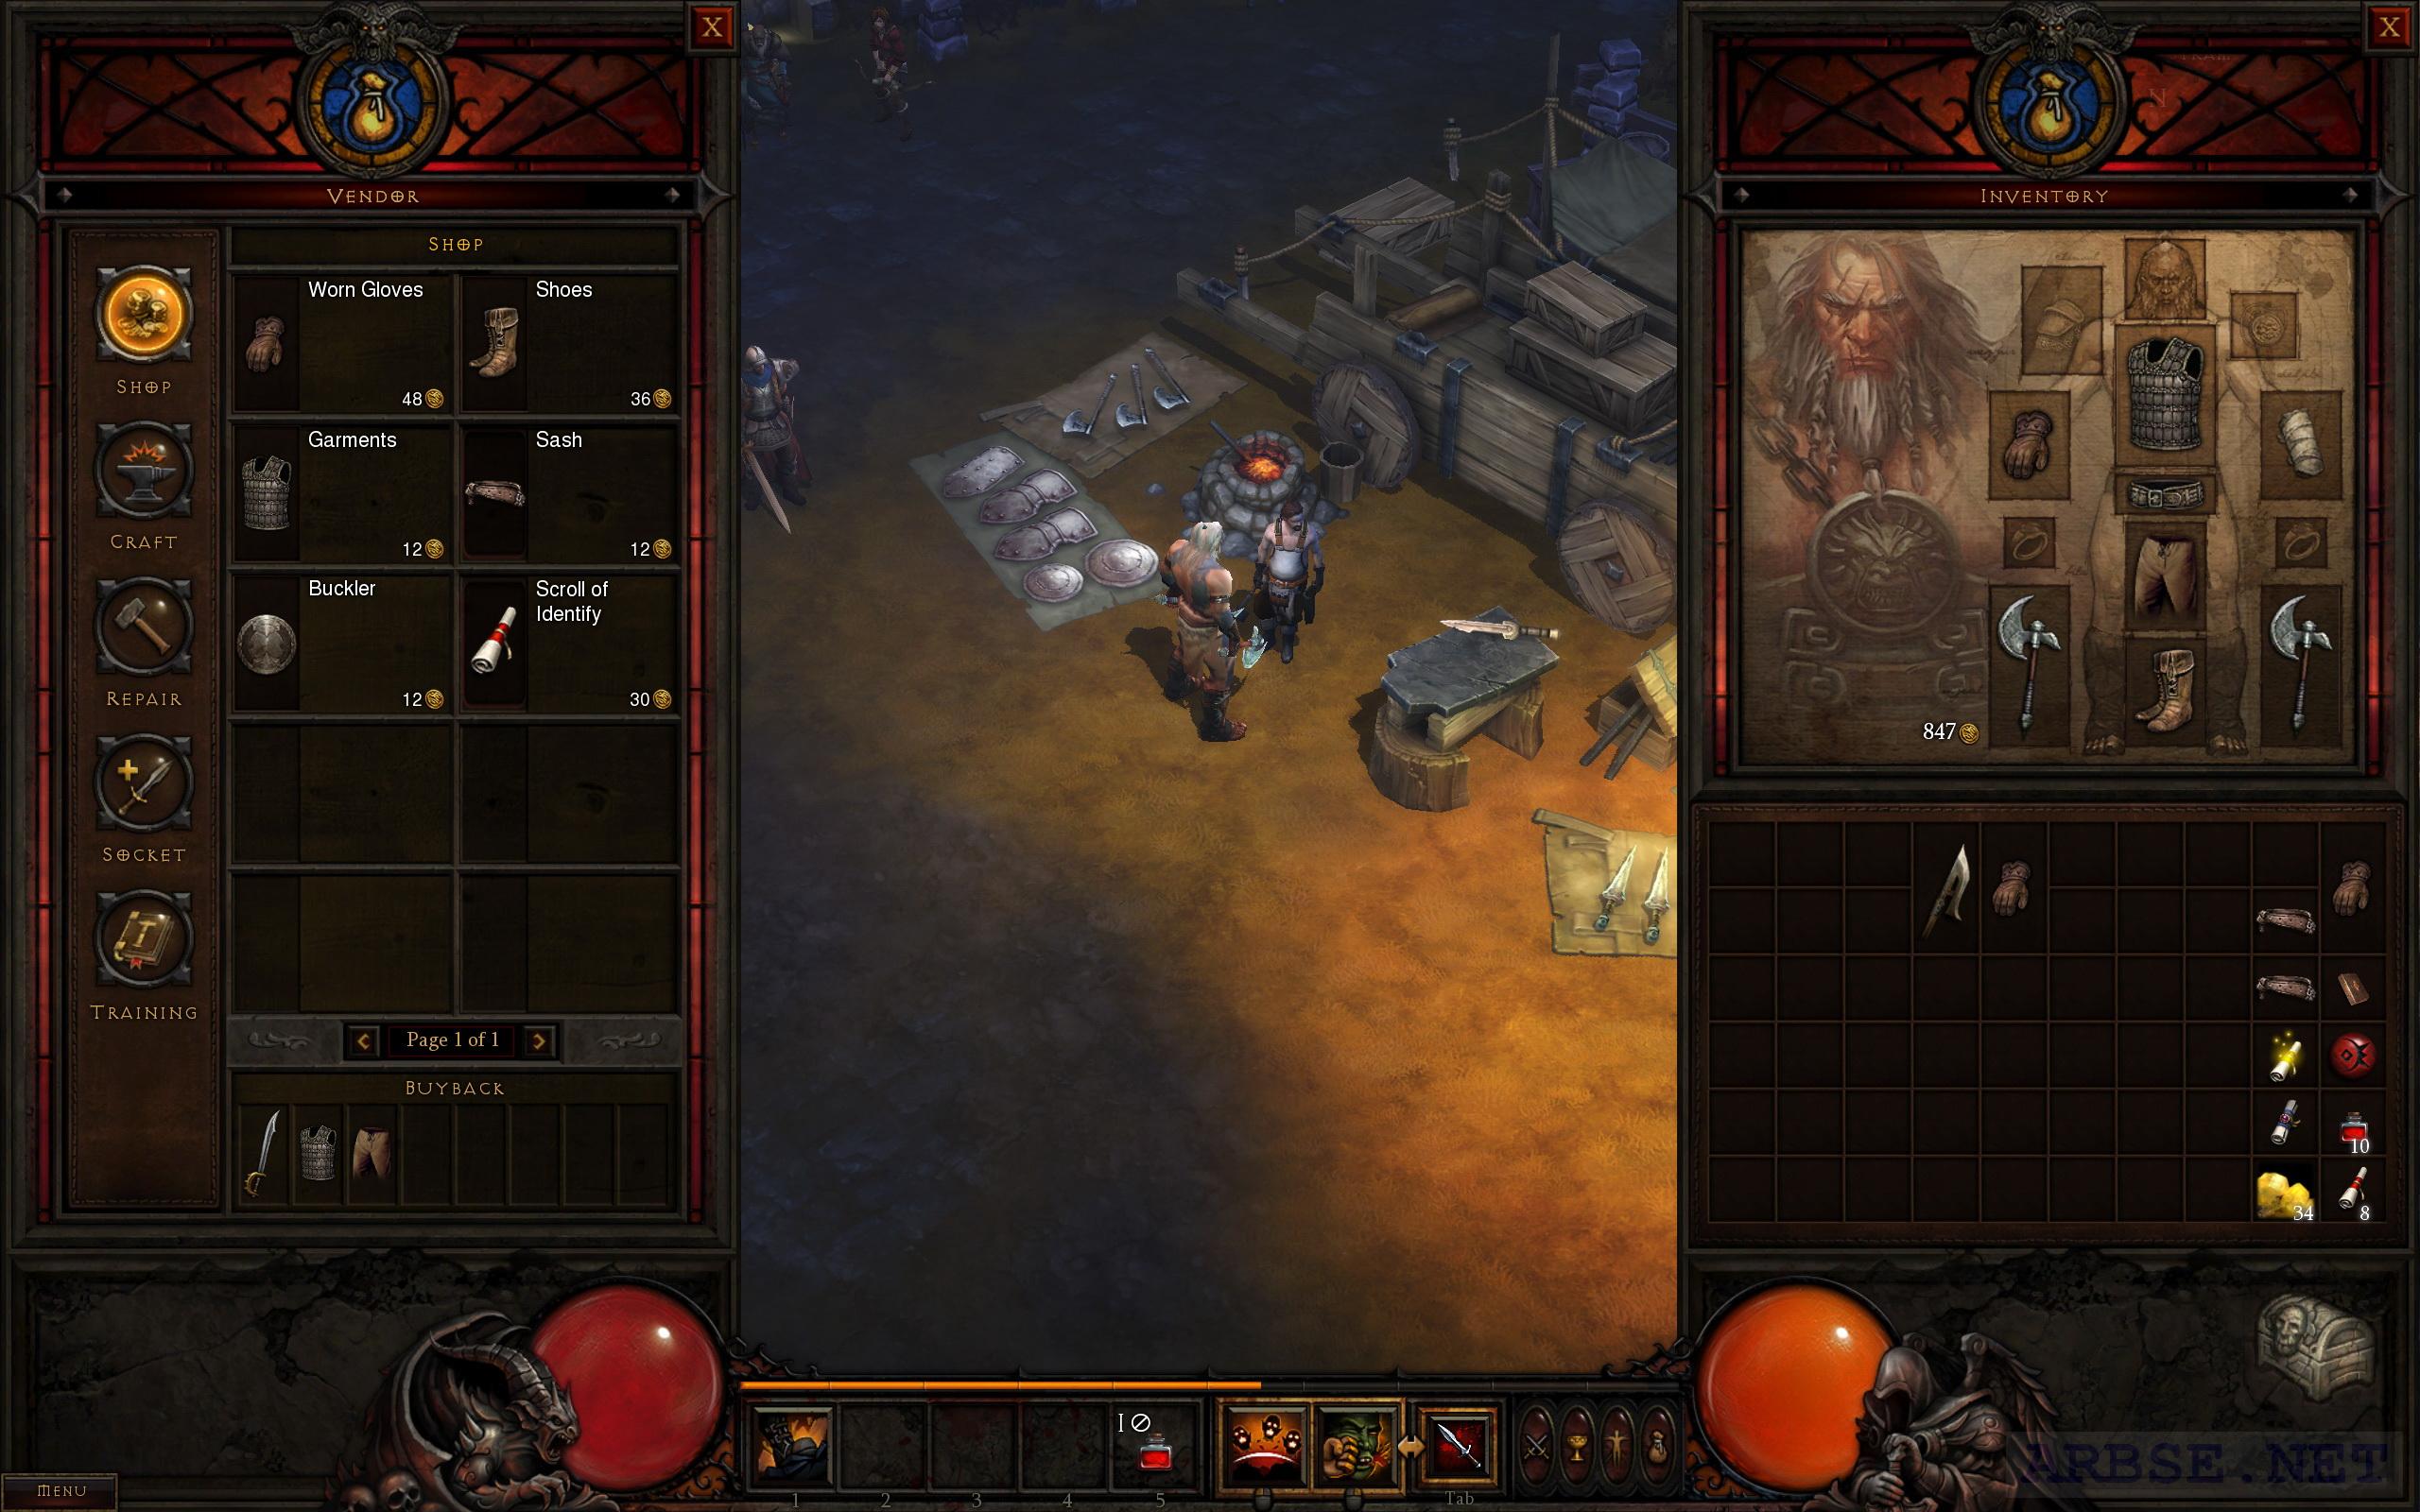 Diablo 3 crafting arbse for Diablo 3 crafting items